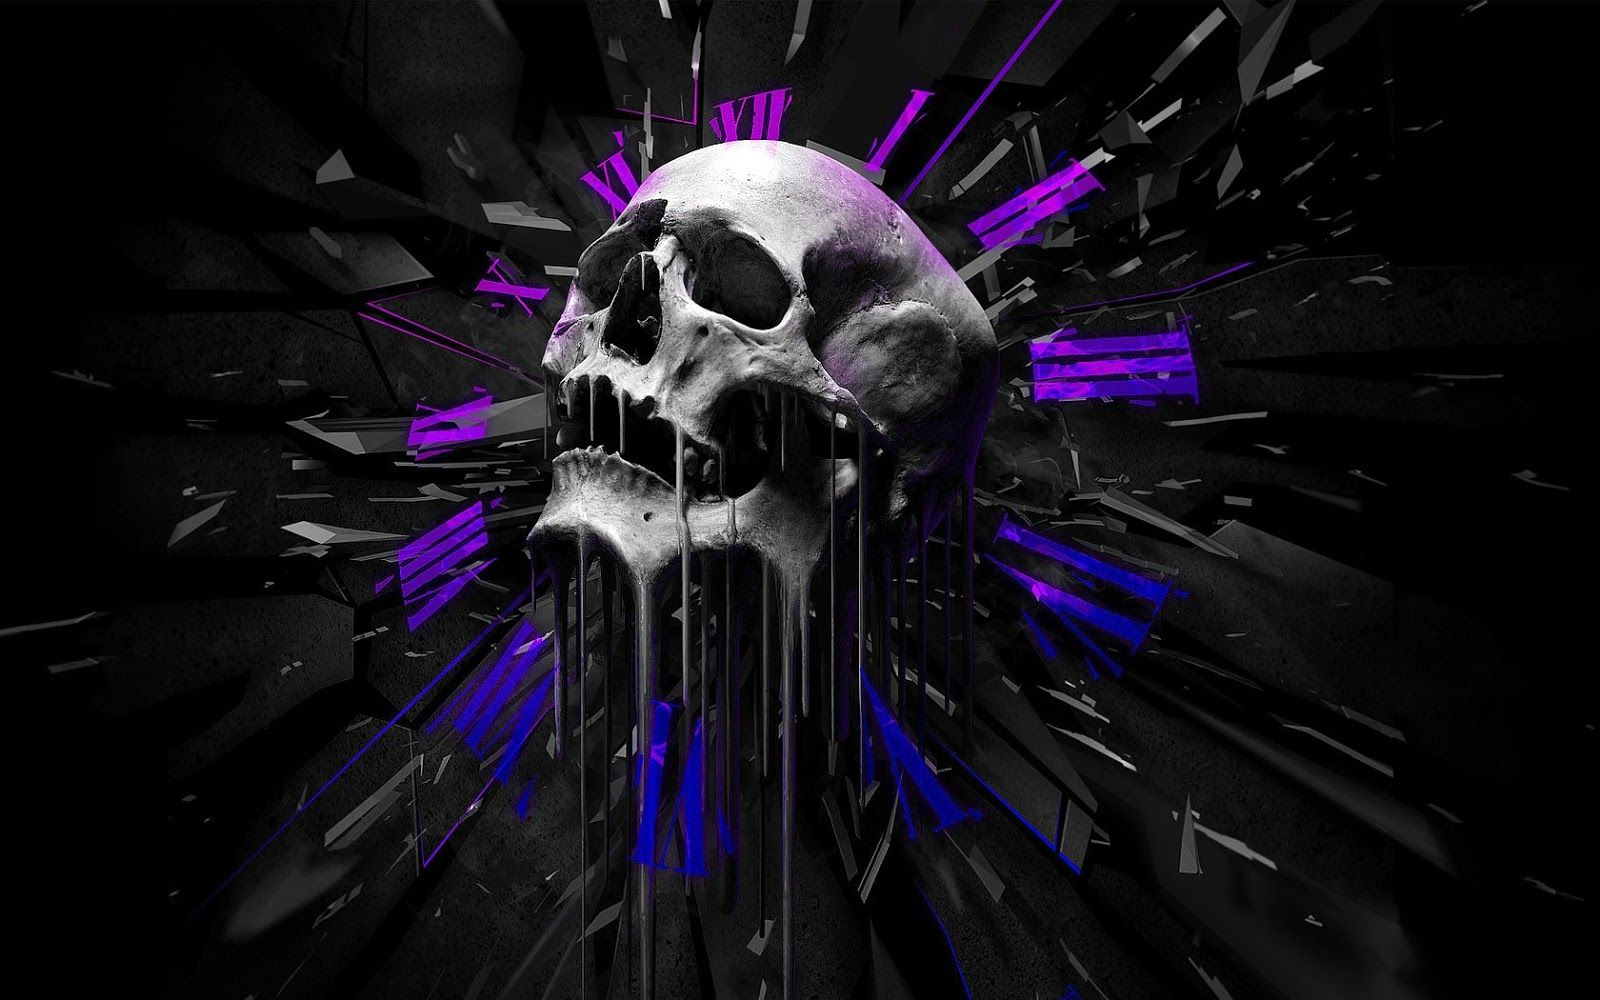 Scrapbook Backgrounds Skull Free Download Skull Wallpapers Free Download Hq Skull Wallpaper Red And Black Wallpaper Skull